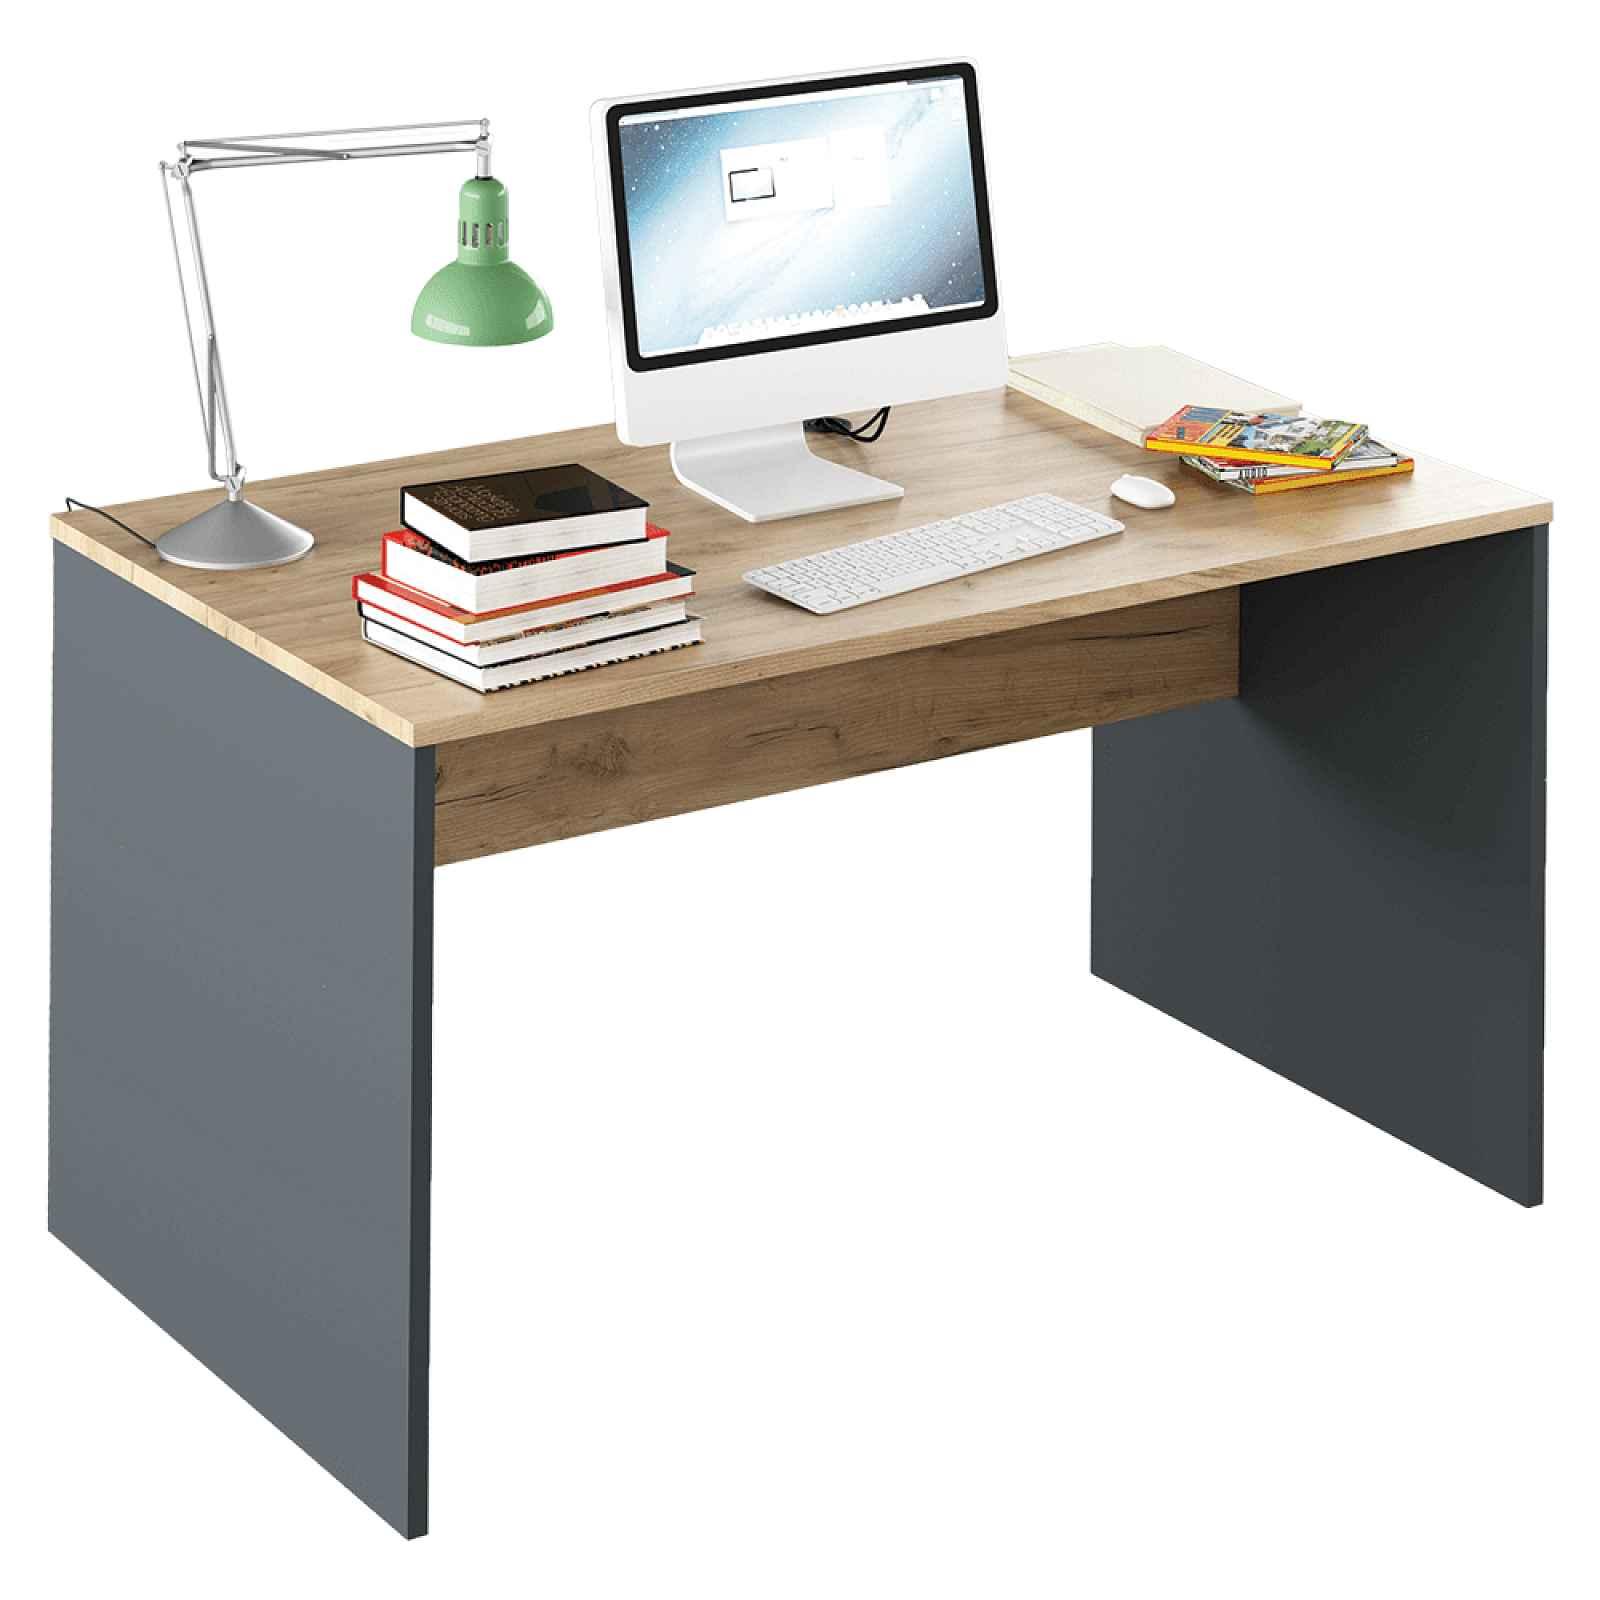 PC stůl, grafit / bílá, Rioma TYP 11 0000185732 Tempo Kondela Grafit / dub artisan